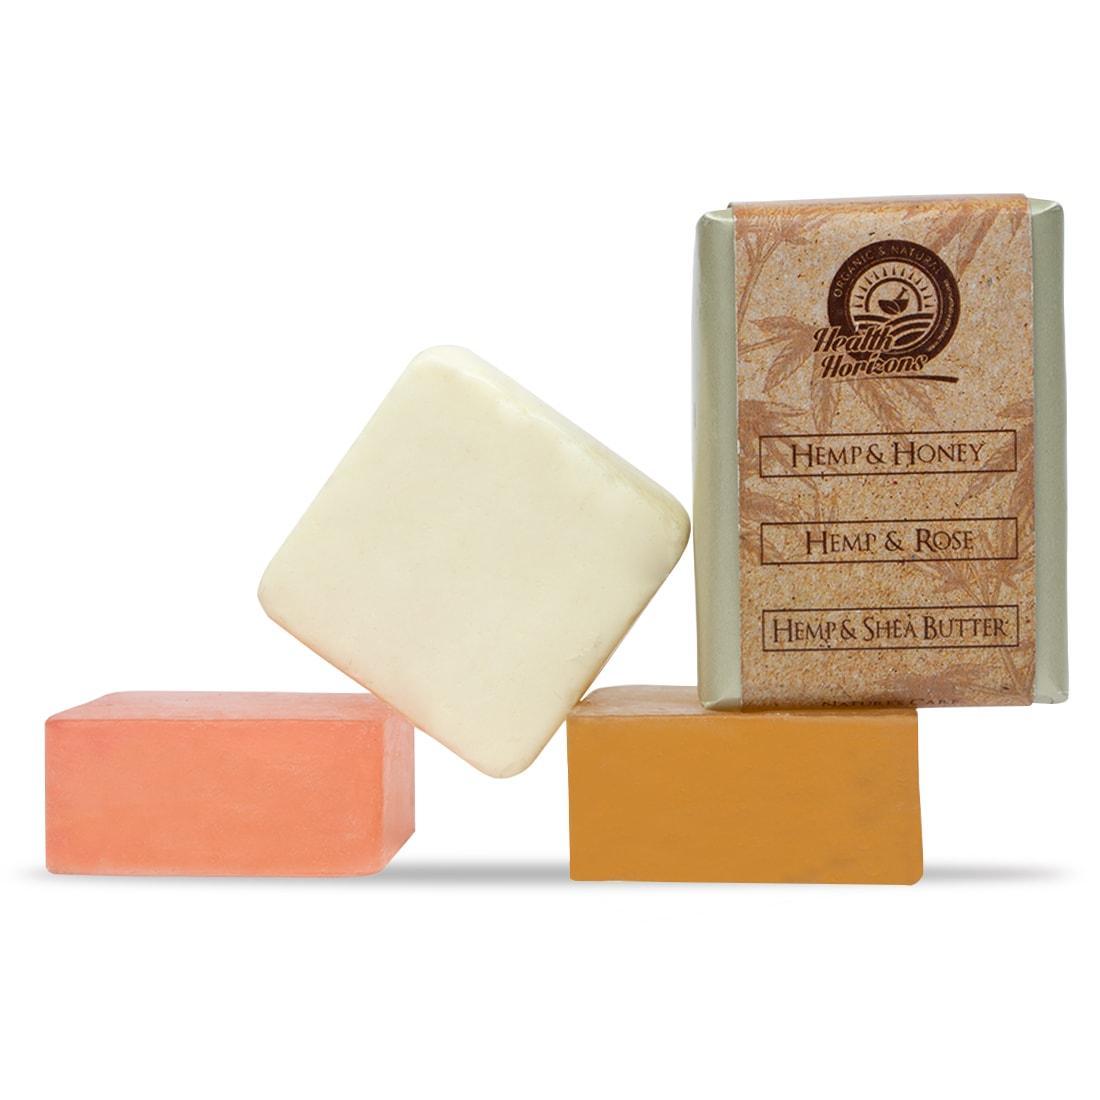 organic soap honey shea butter with Hemp